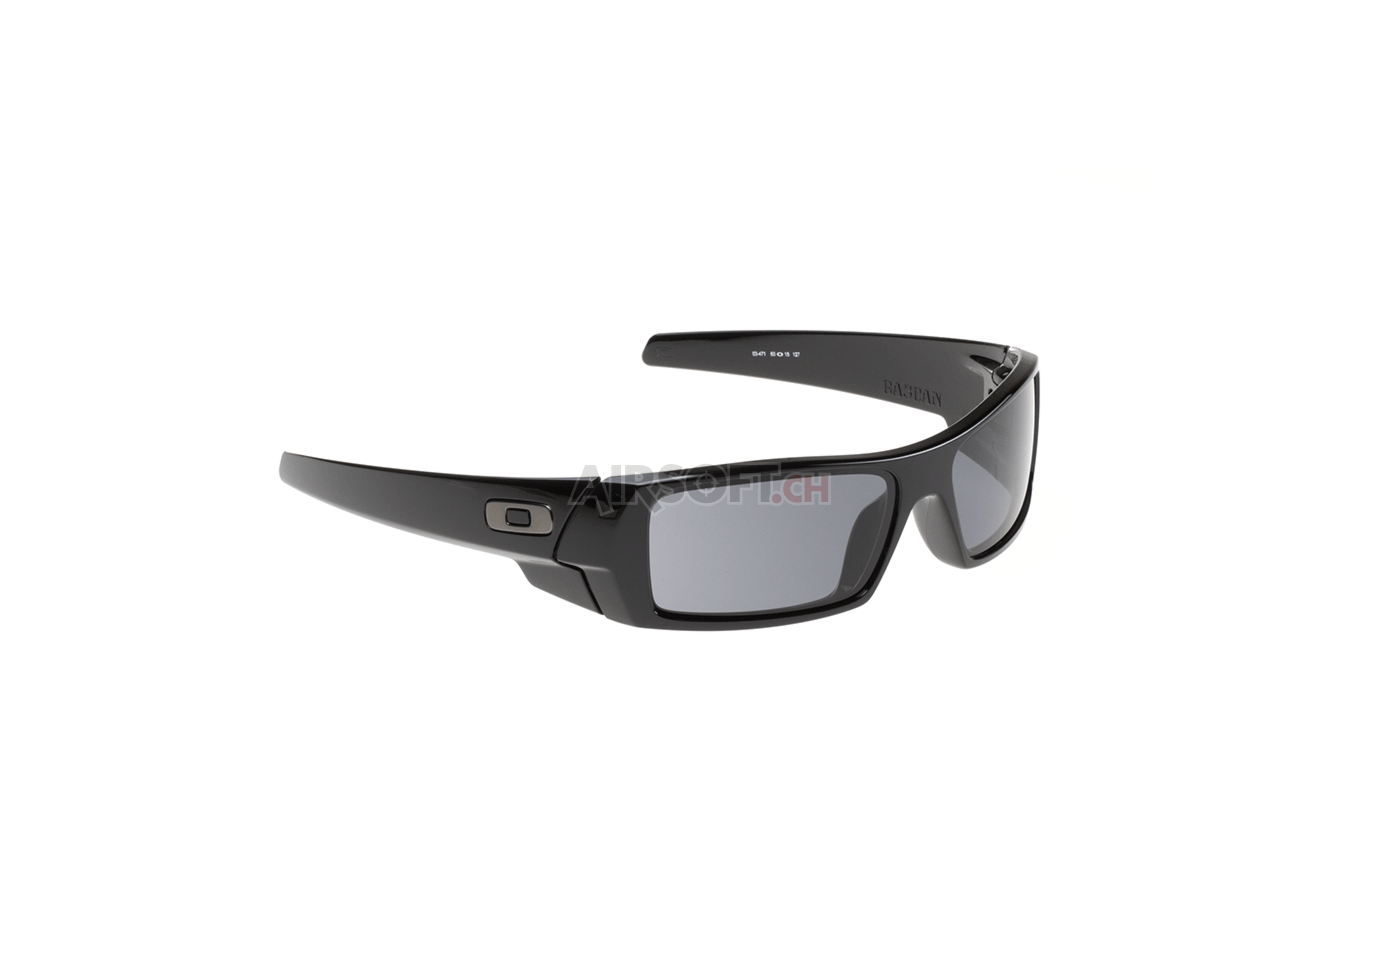 487f3b3497 SI Gascan Black (Oakley) - Eyewear - Protective Equipment - airsoft ...